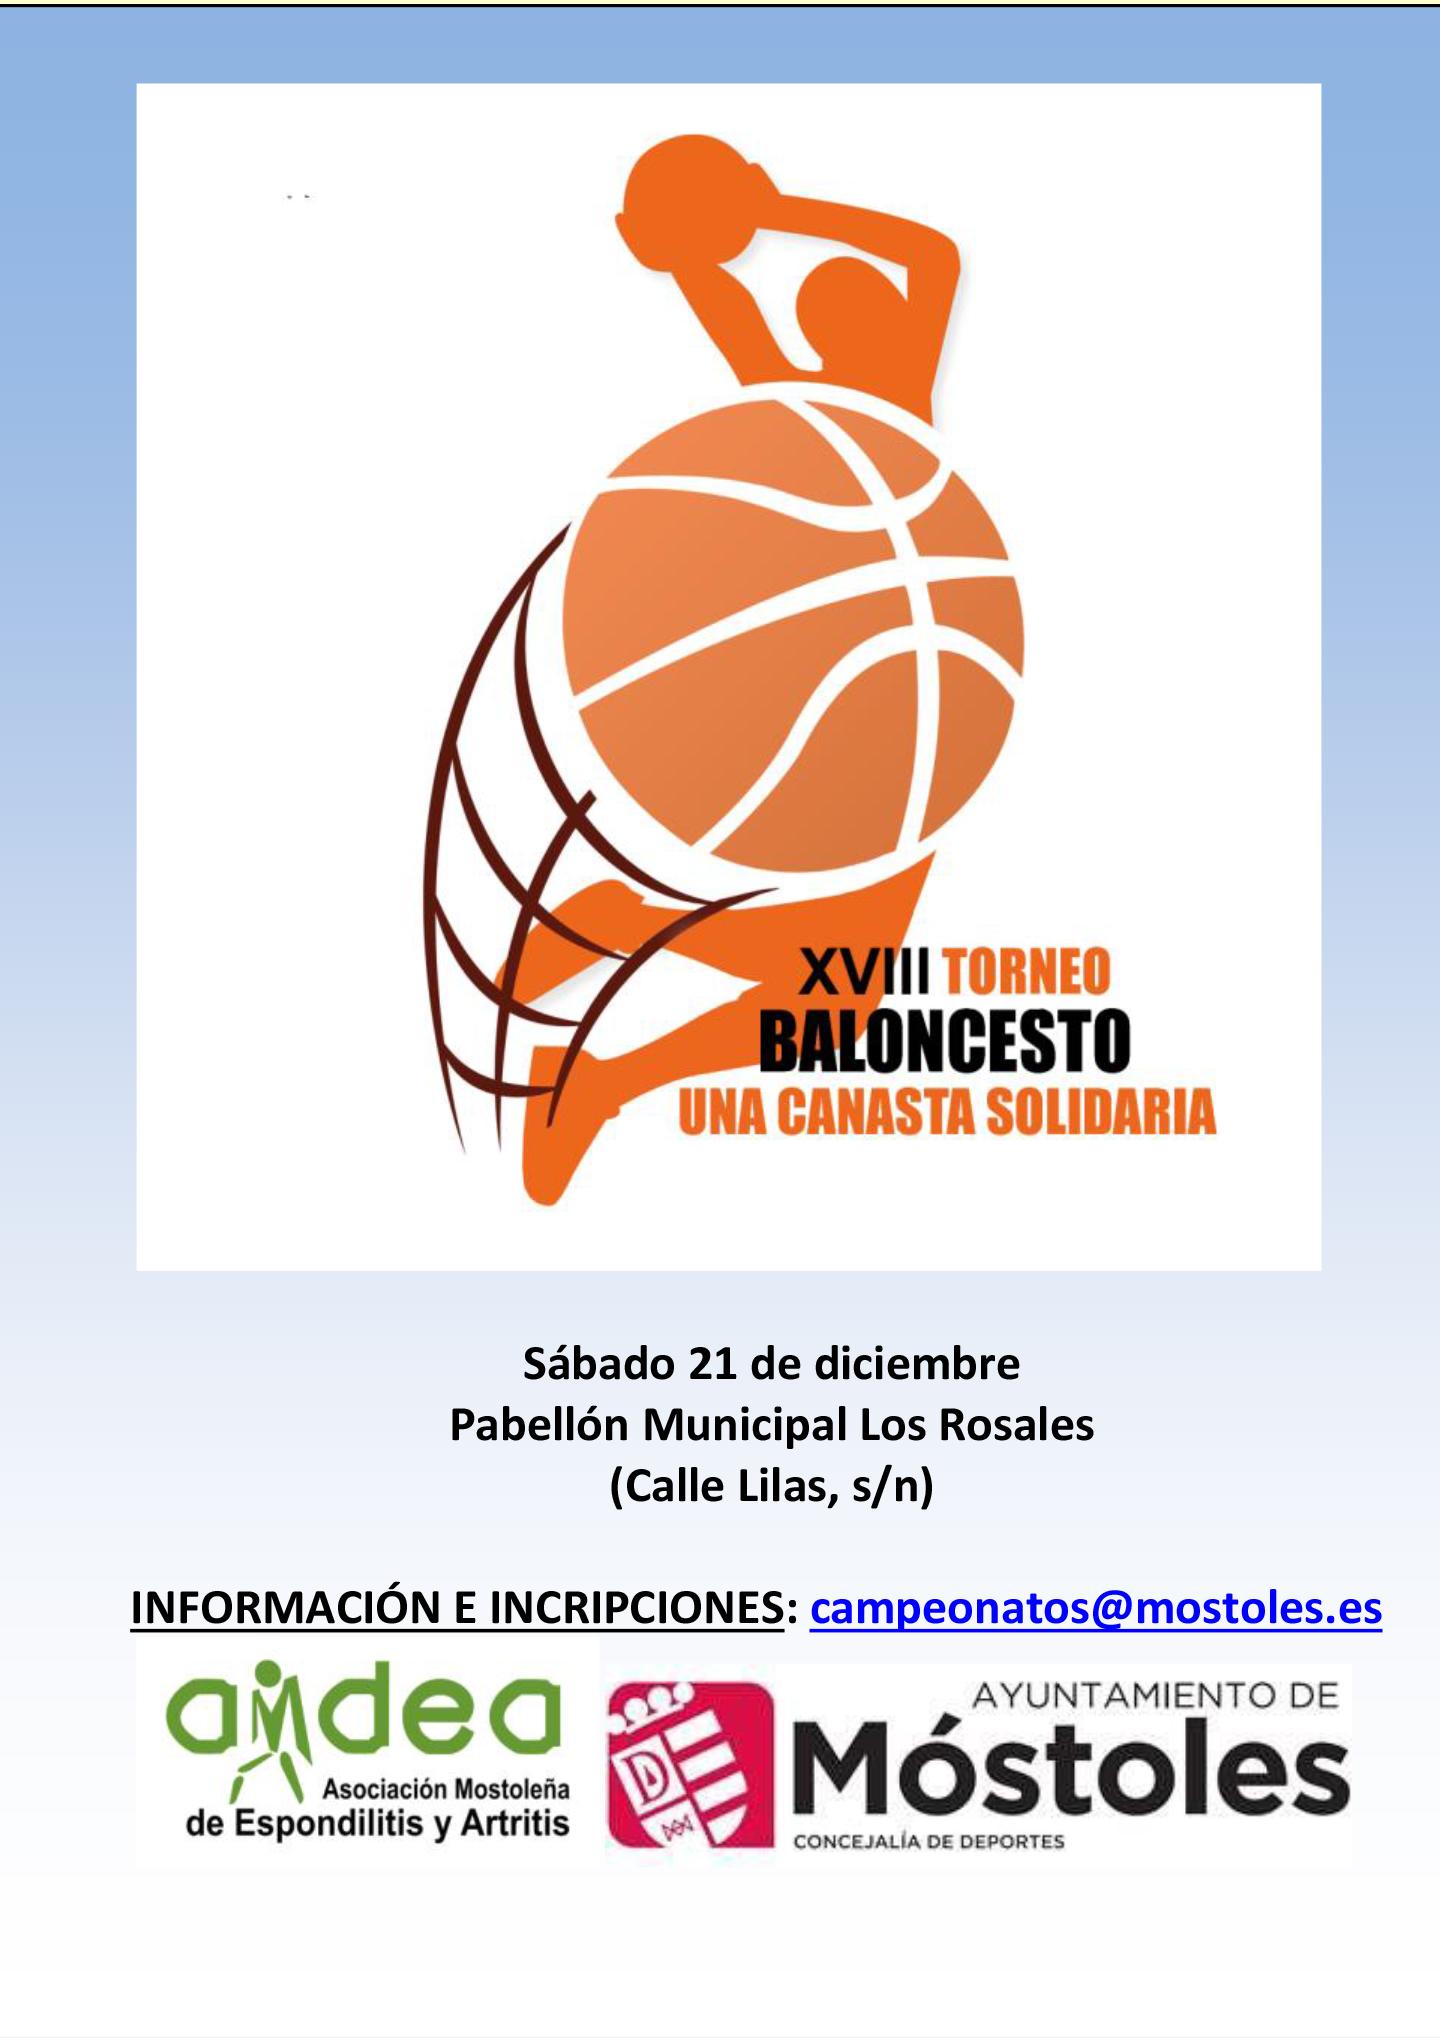 XVIII Torneo Canasta Solidaria